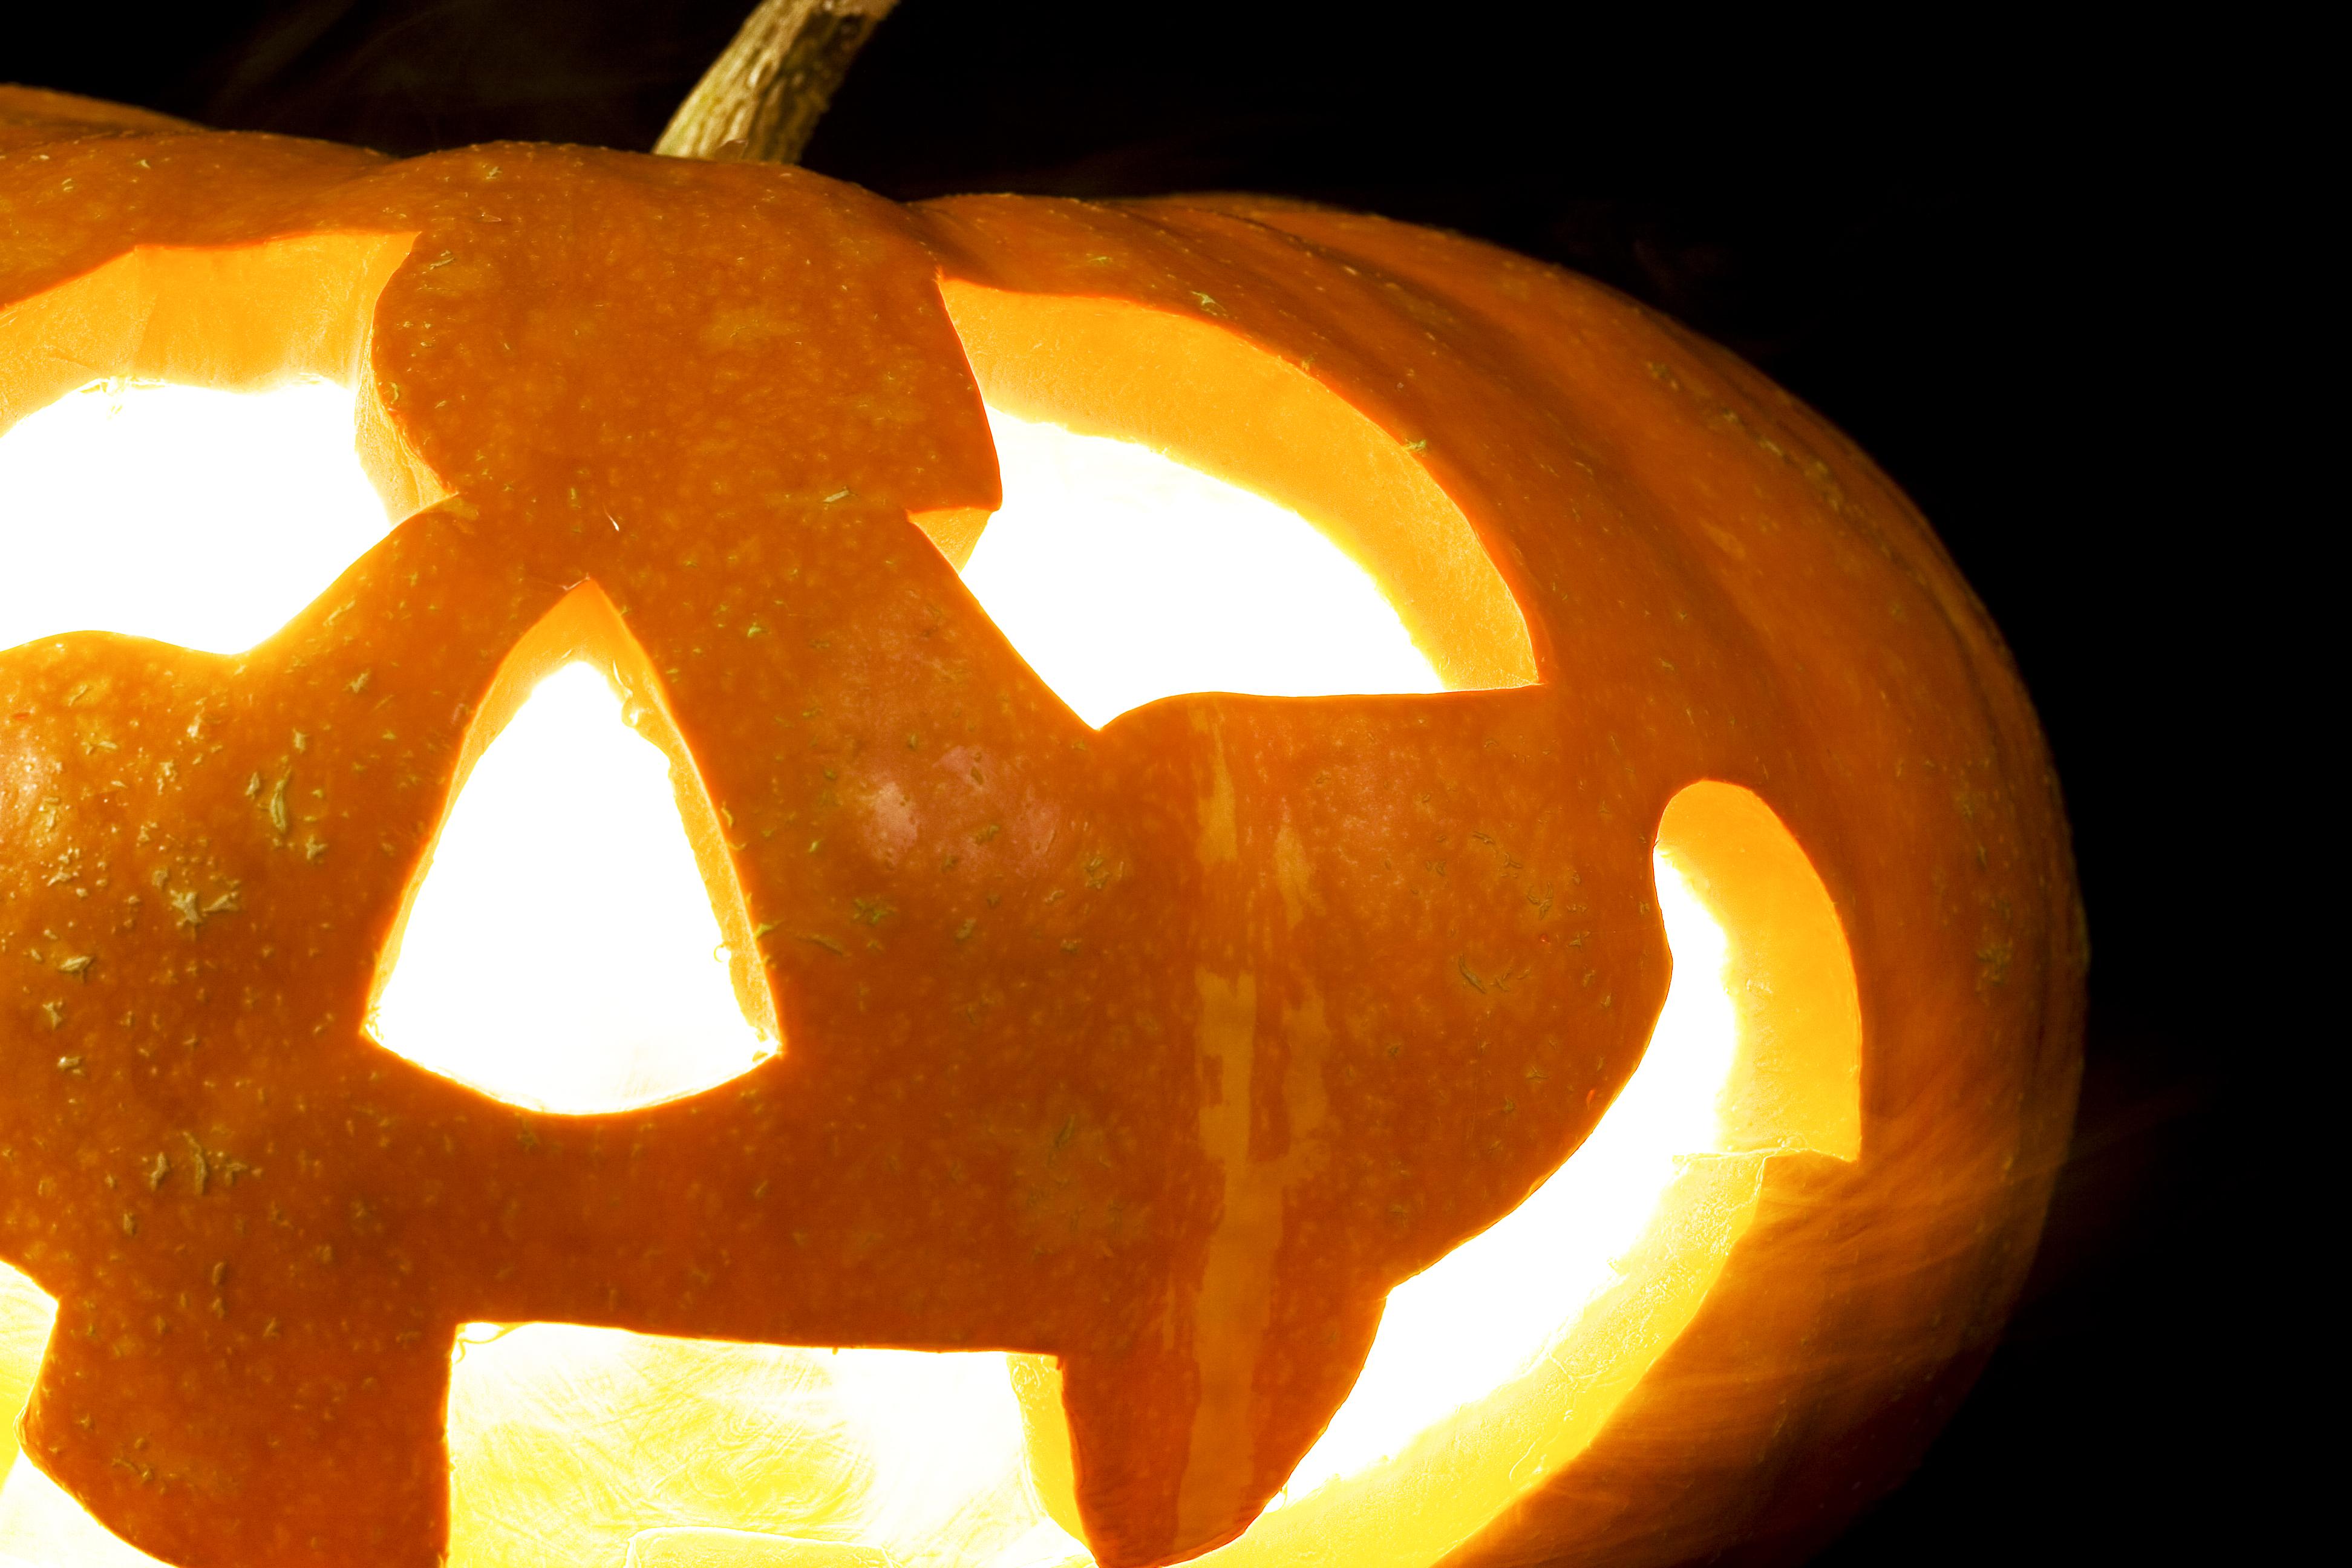 halloween pumpkin, Autumn, Season, Orange, Pumpkin, HQ Photo